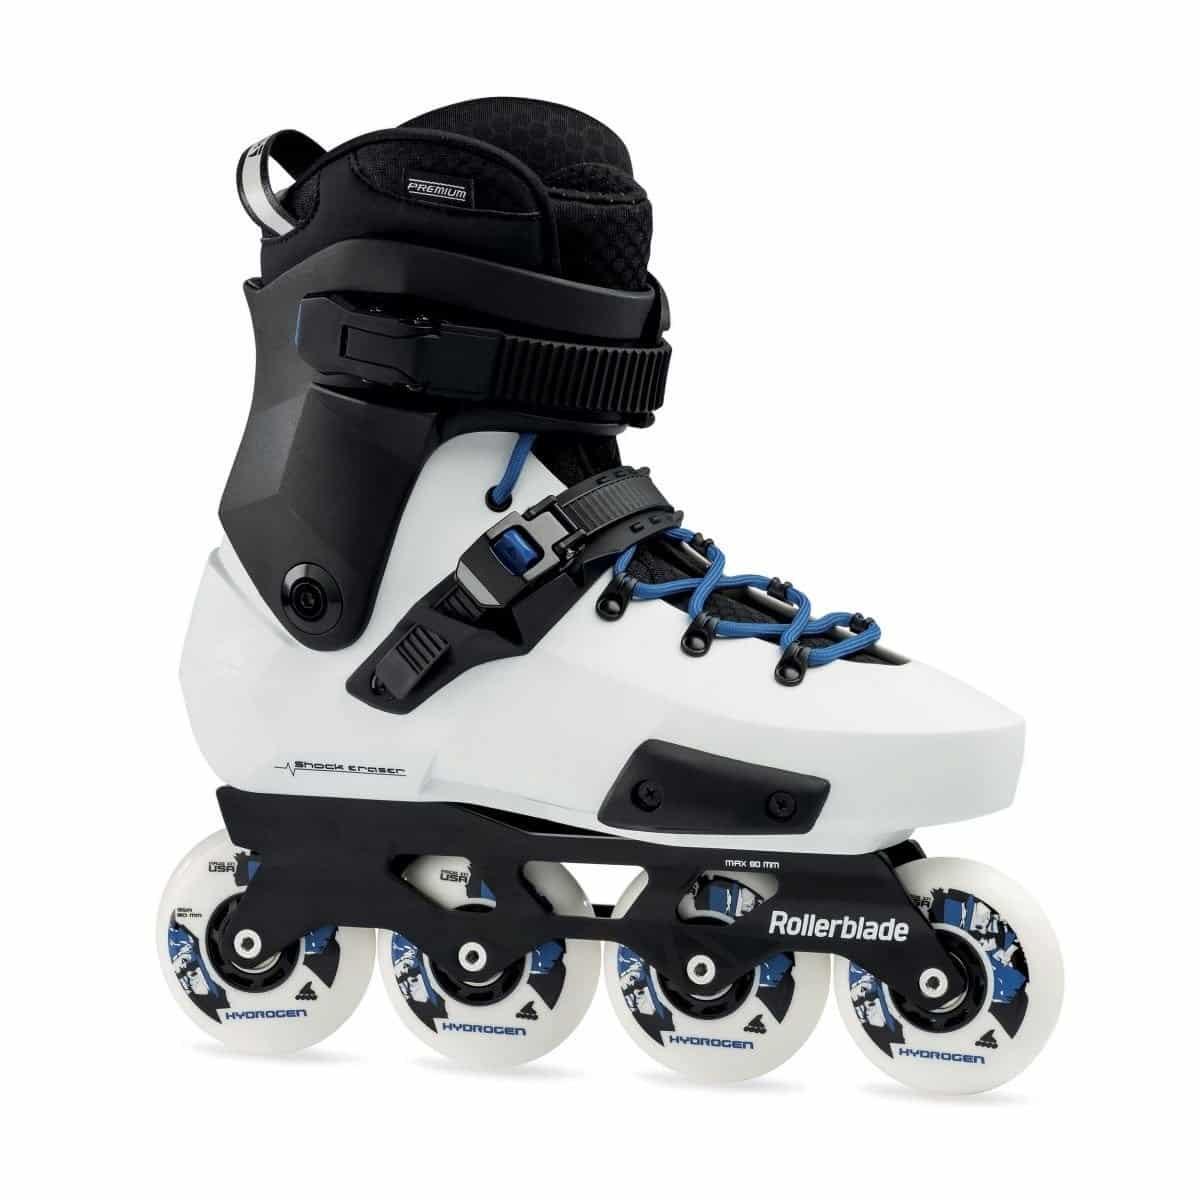 rollerblade twister edge x 2020